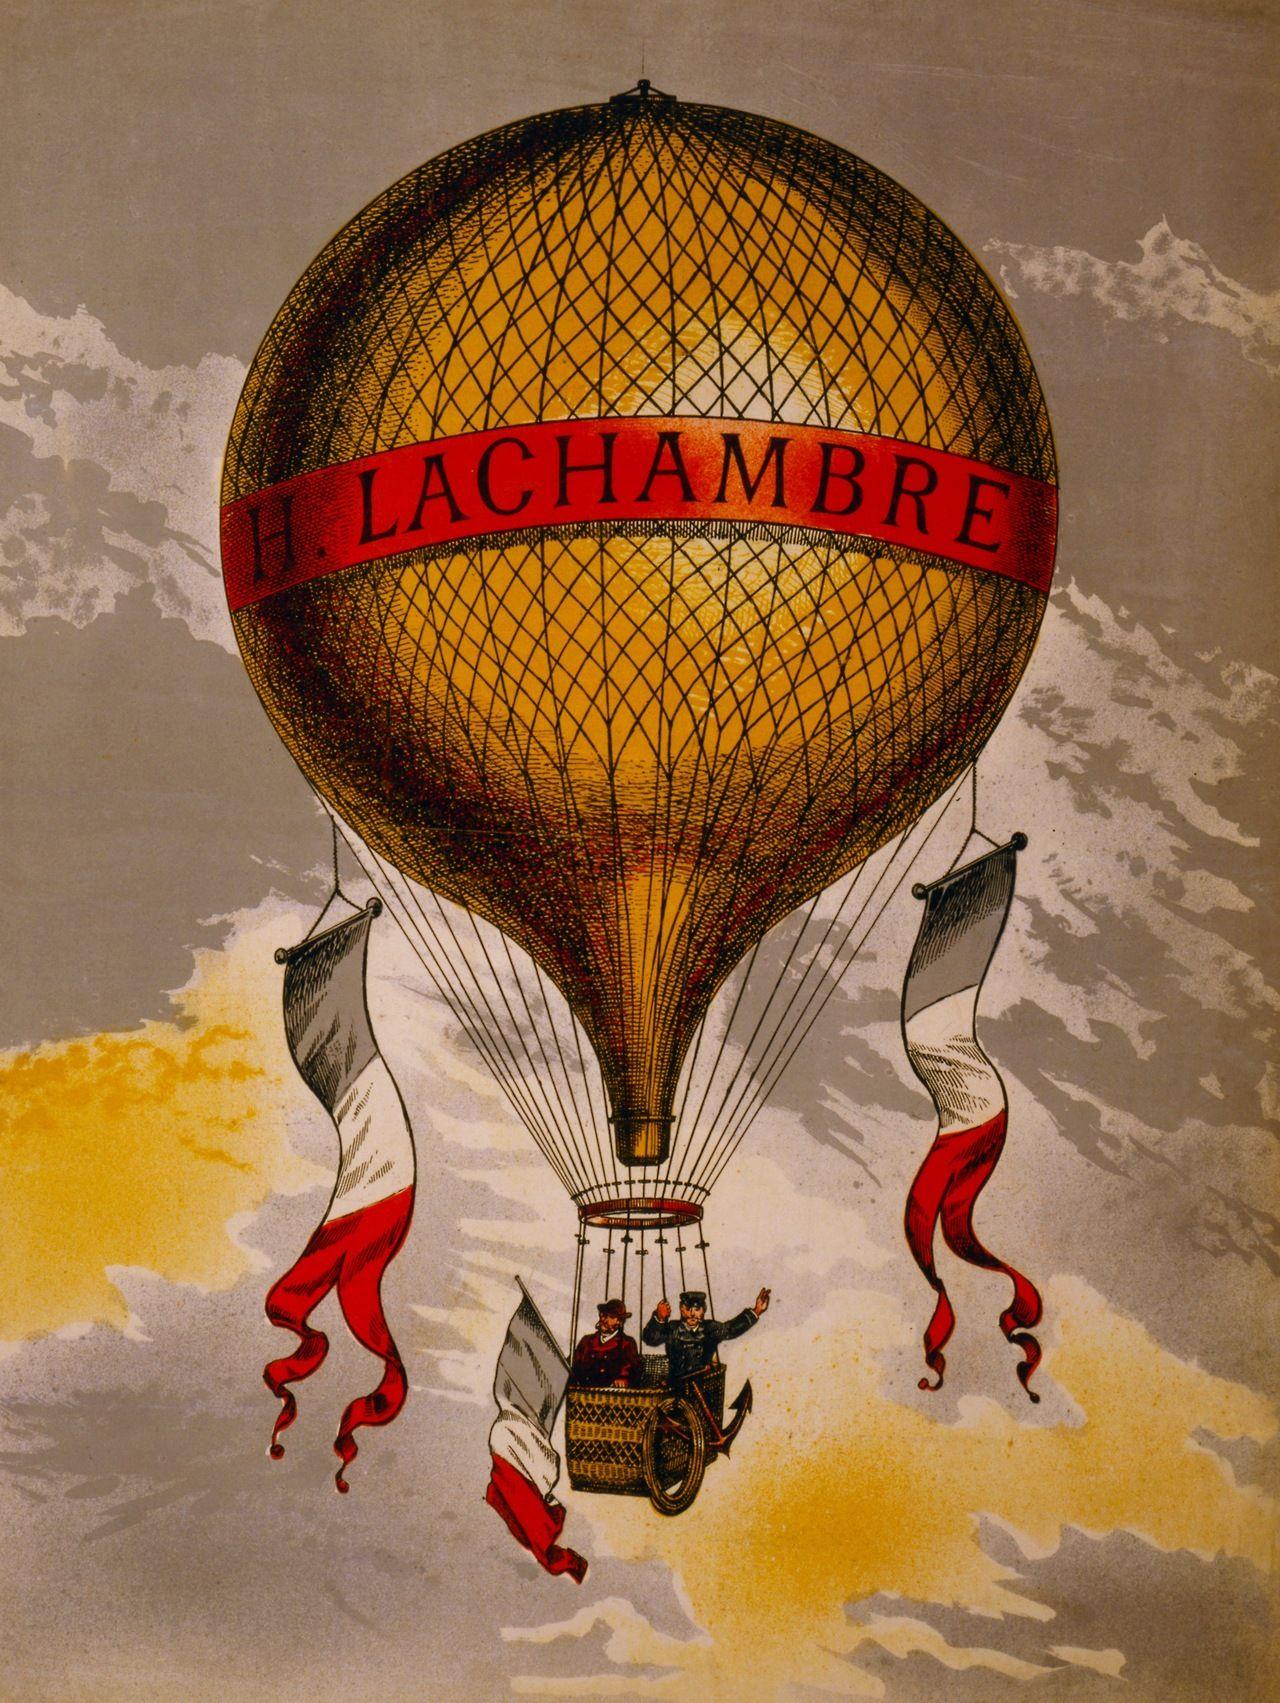 Henri Lachambre\'s Hot Air Balloon (color lithograph), Paris, France ...